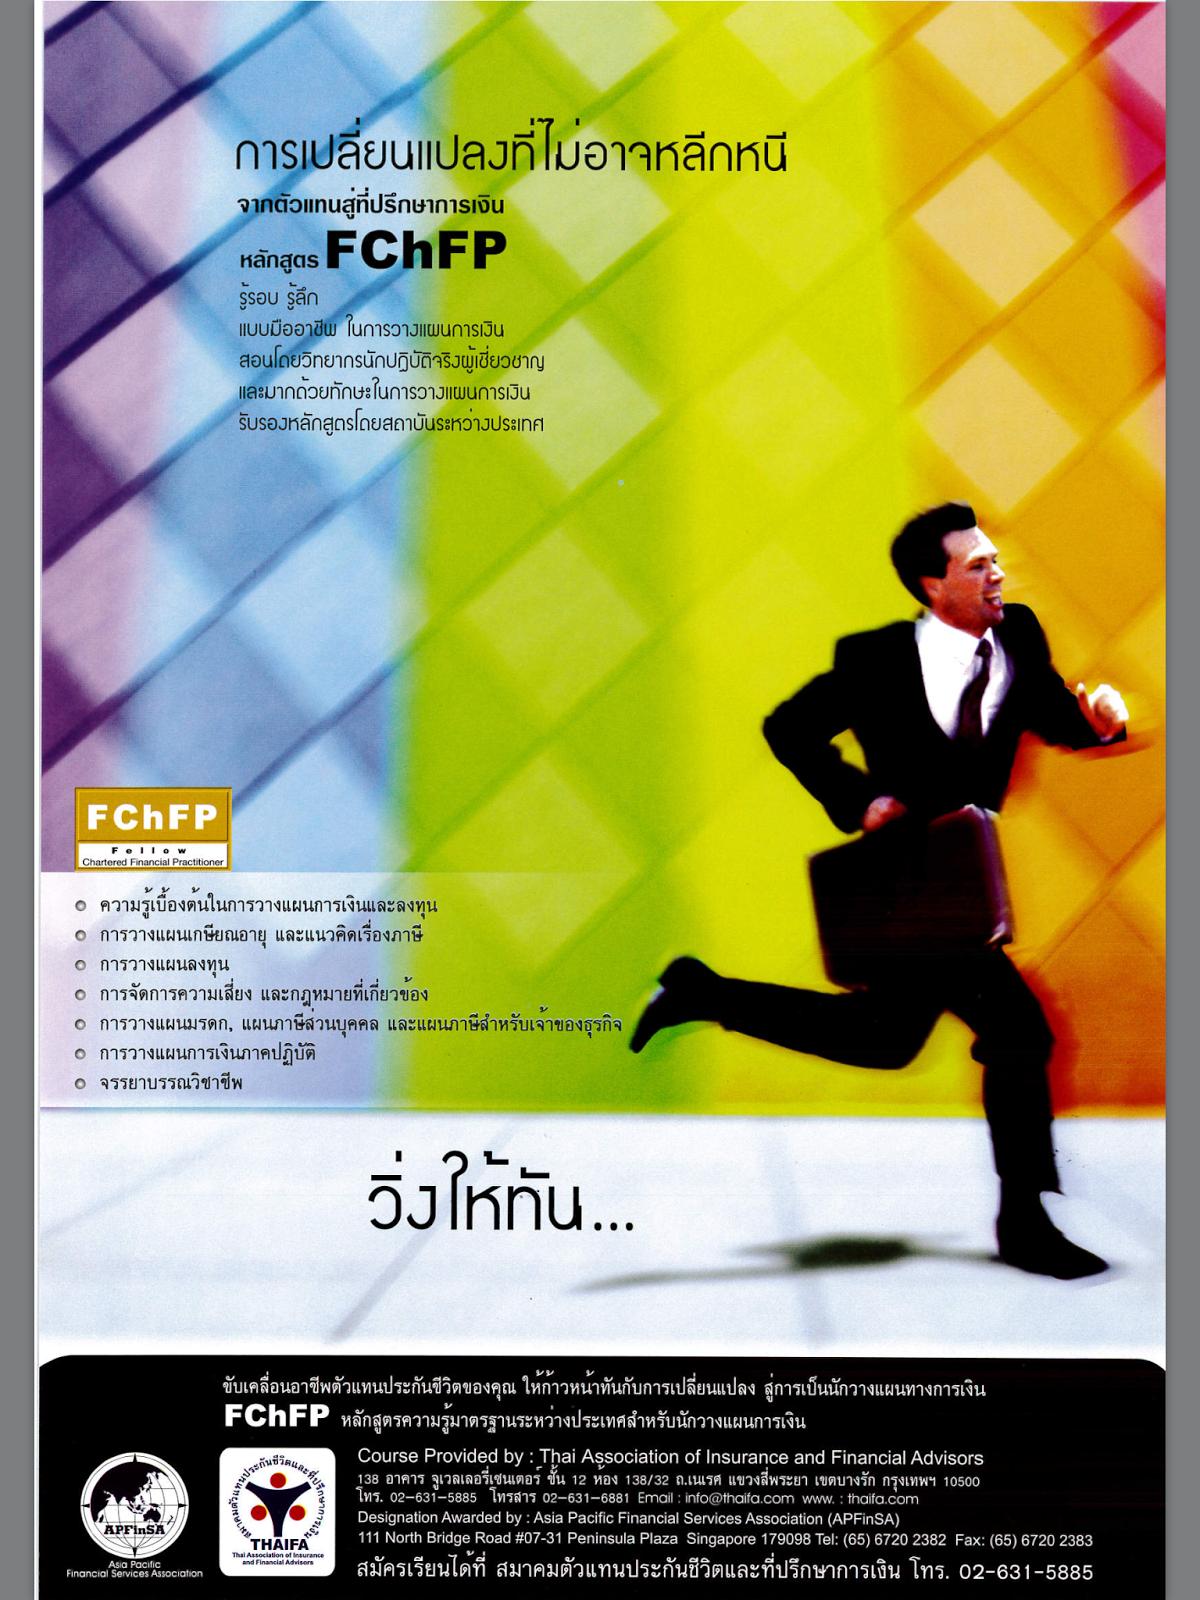 FChFP